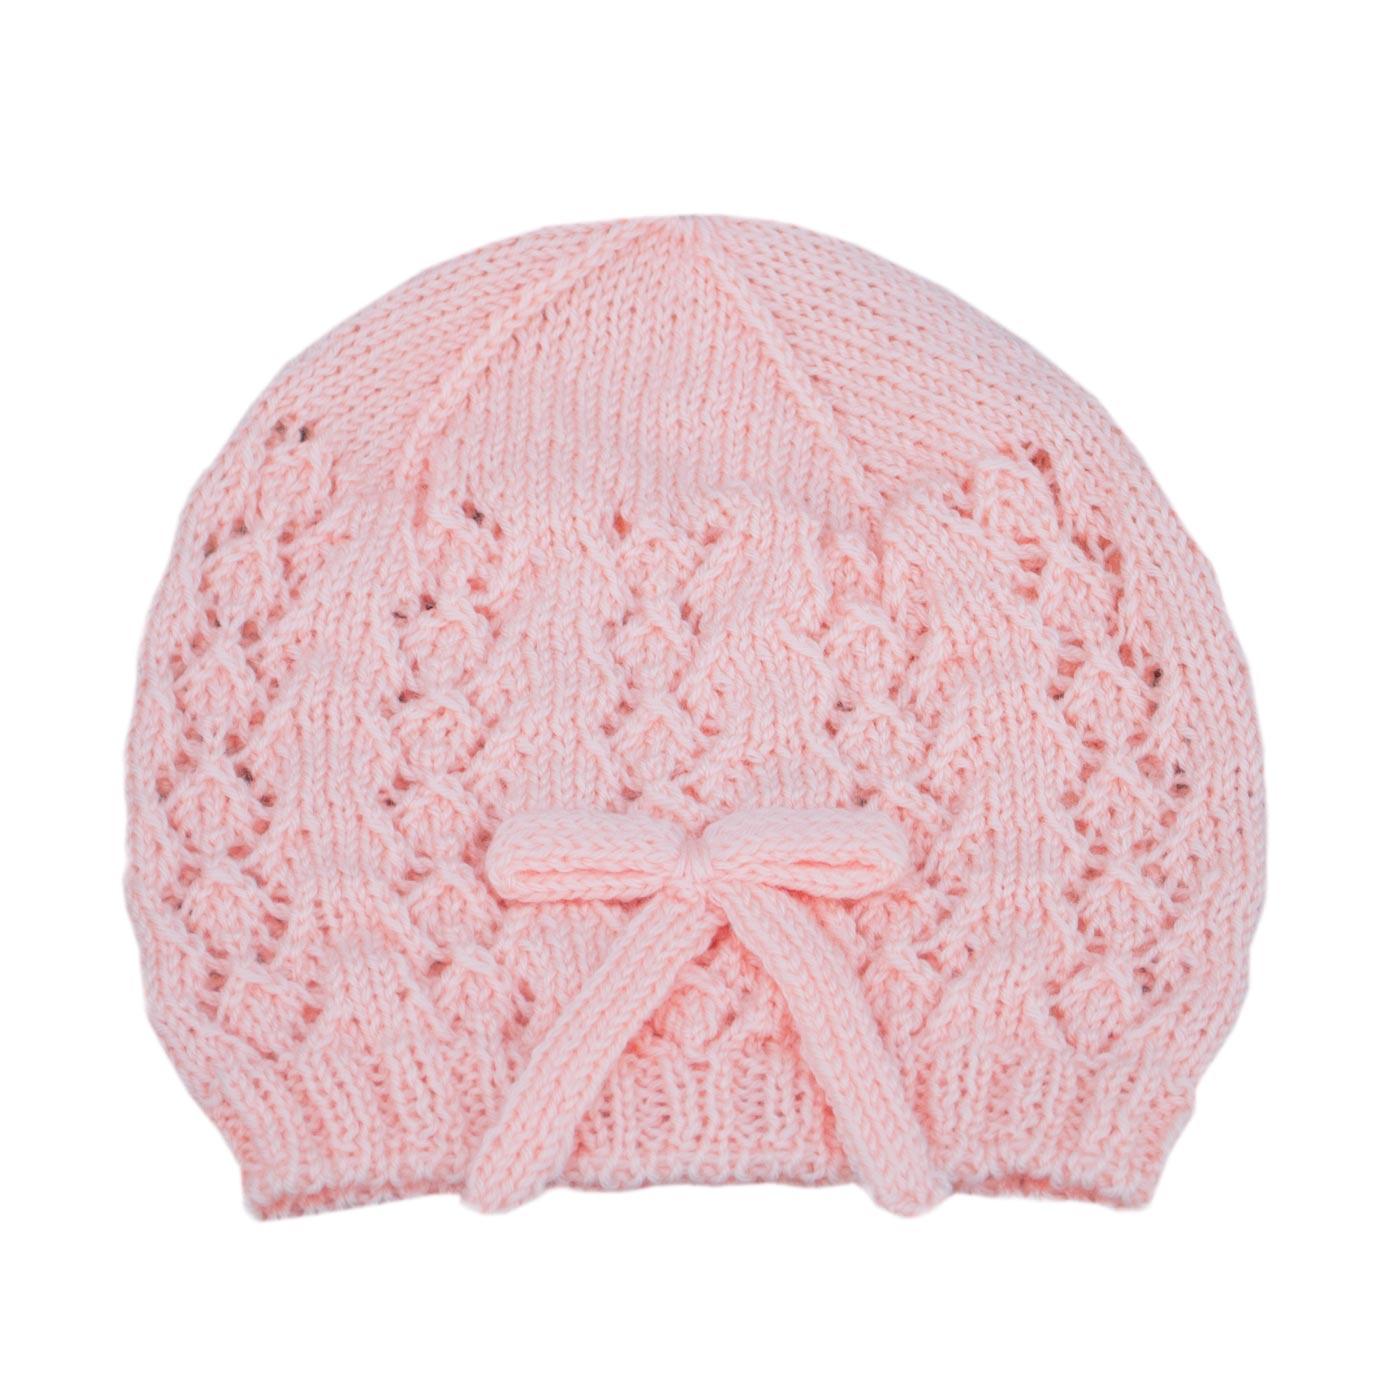 Cappellino bambina 3 mesi lana rosa  194a5e97ca7f